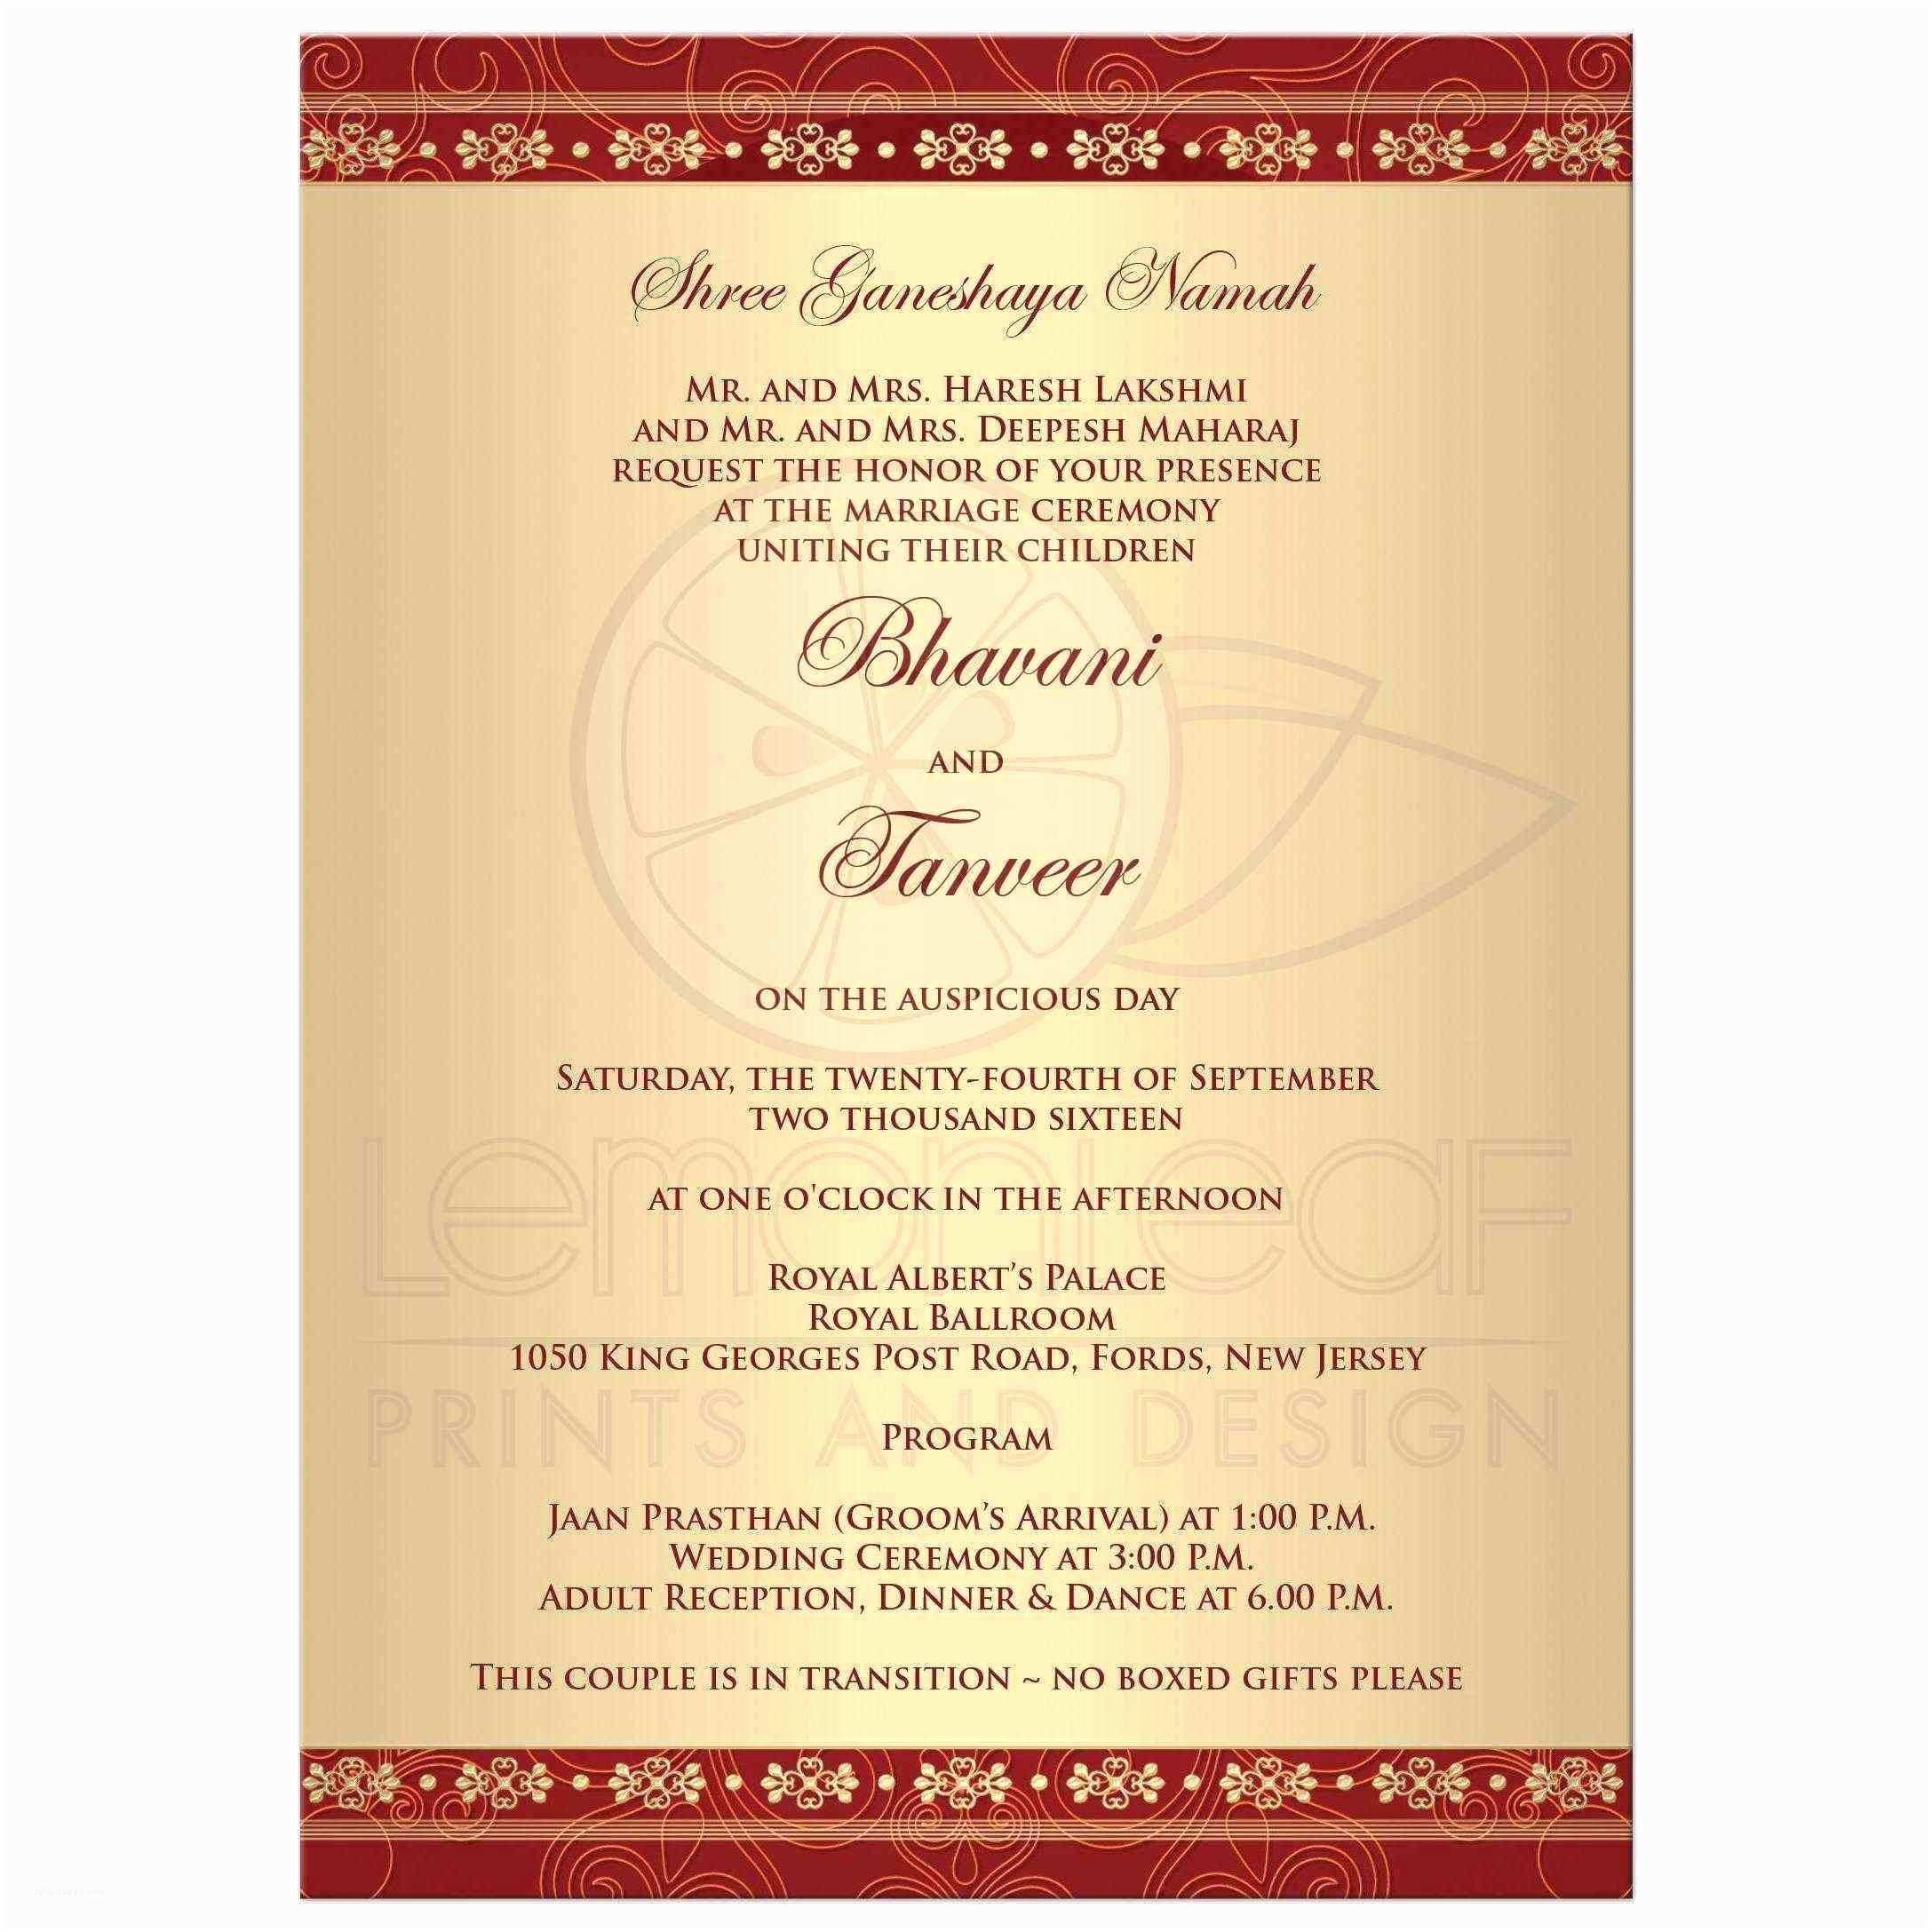 Filipino Wedding Invitation Sample Sample Wedding Invitation Tagalog Version Image